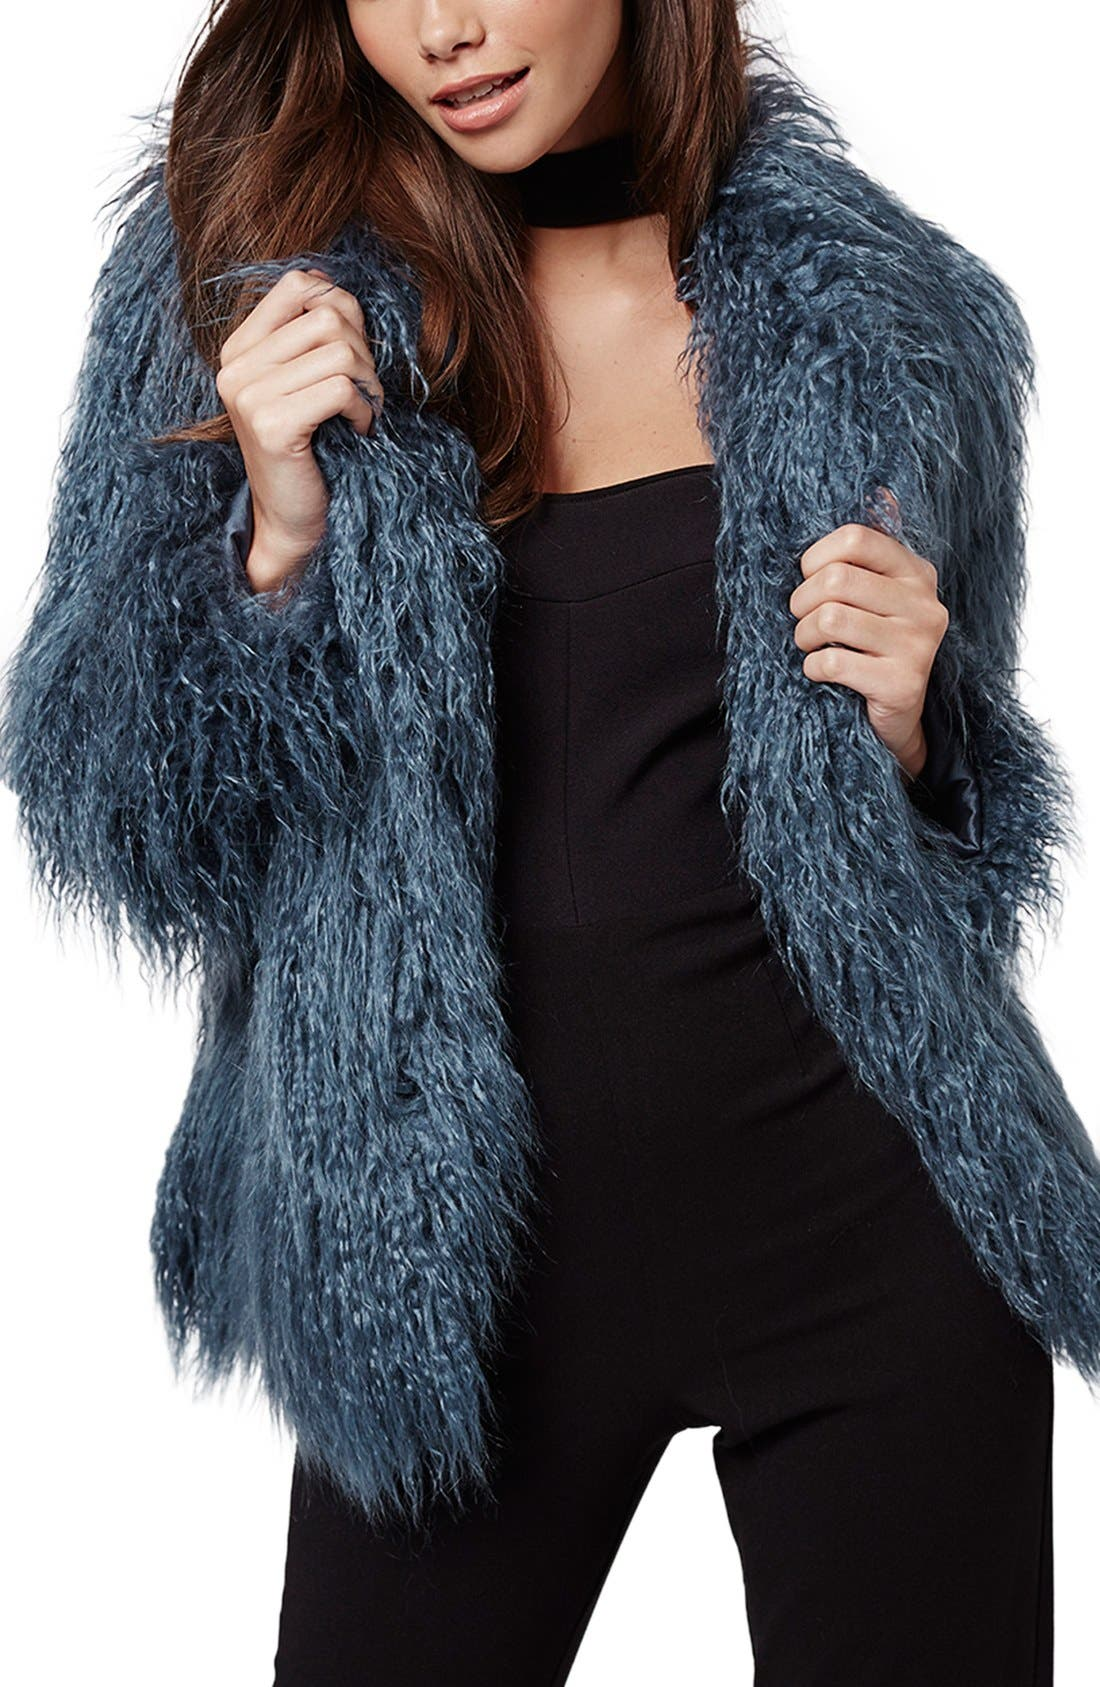 Alternate Image 1 Selected - KENDALL + KYLIE at Topshop Faux Fur Coat